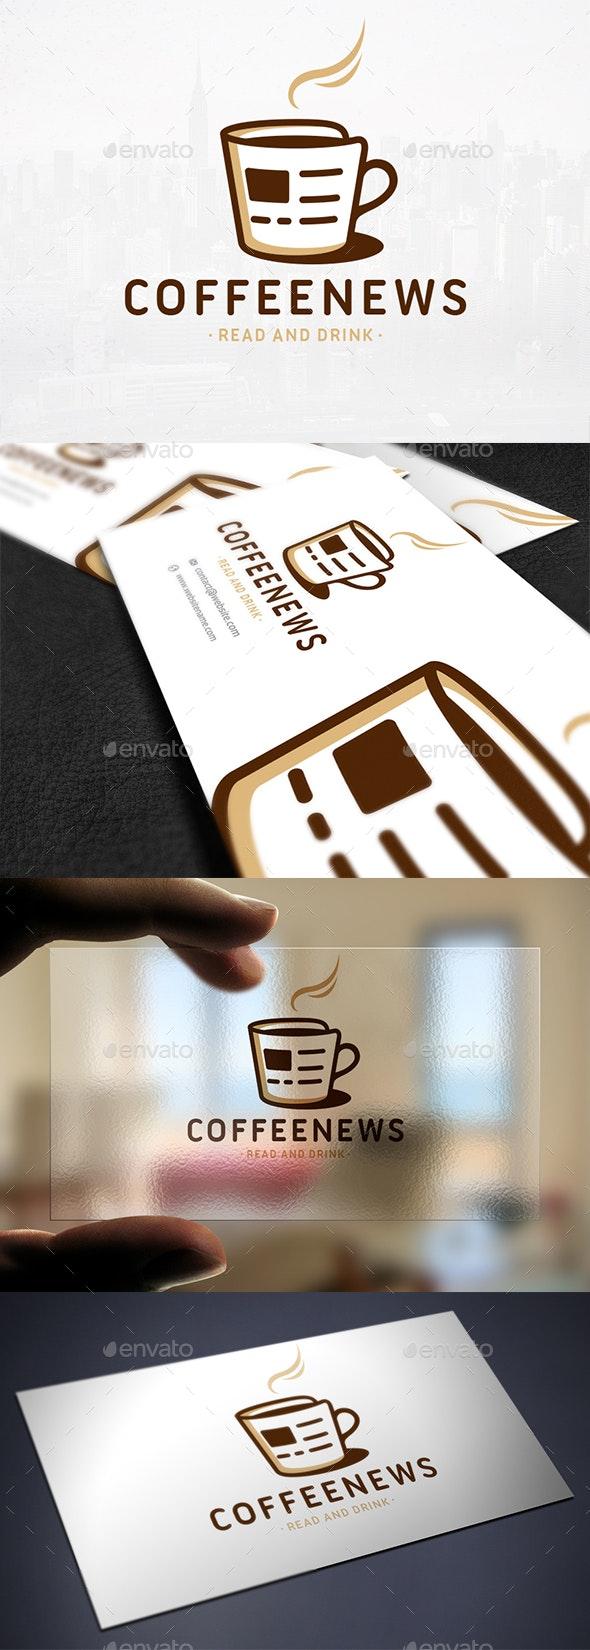 Coffee & News Logo Template - Objects Logo Templates